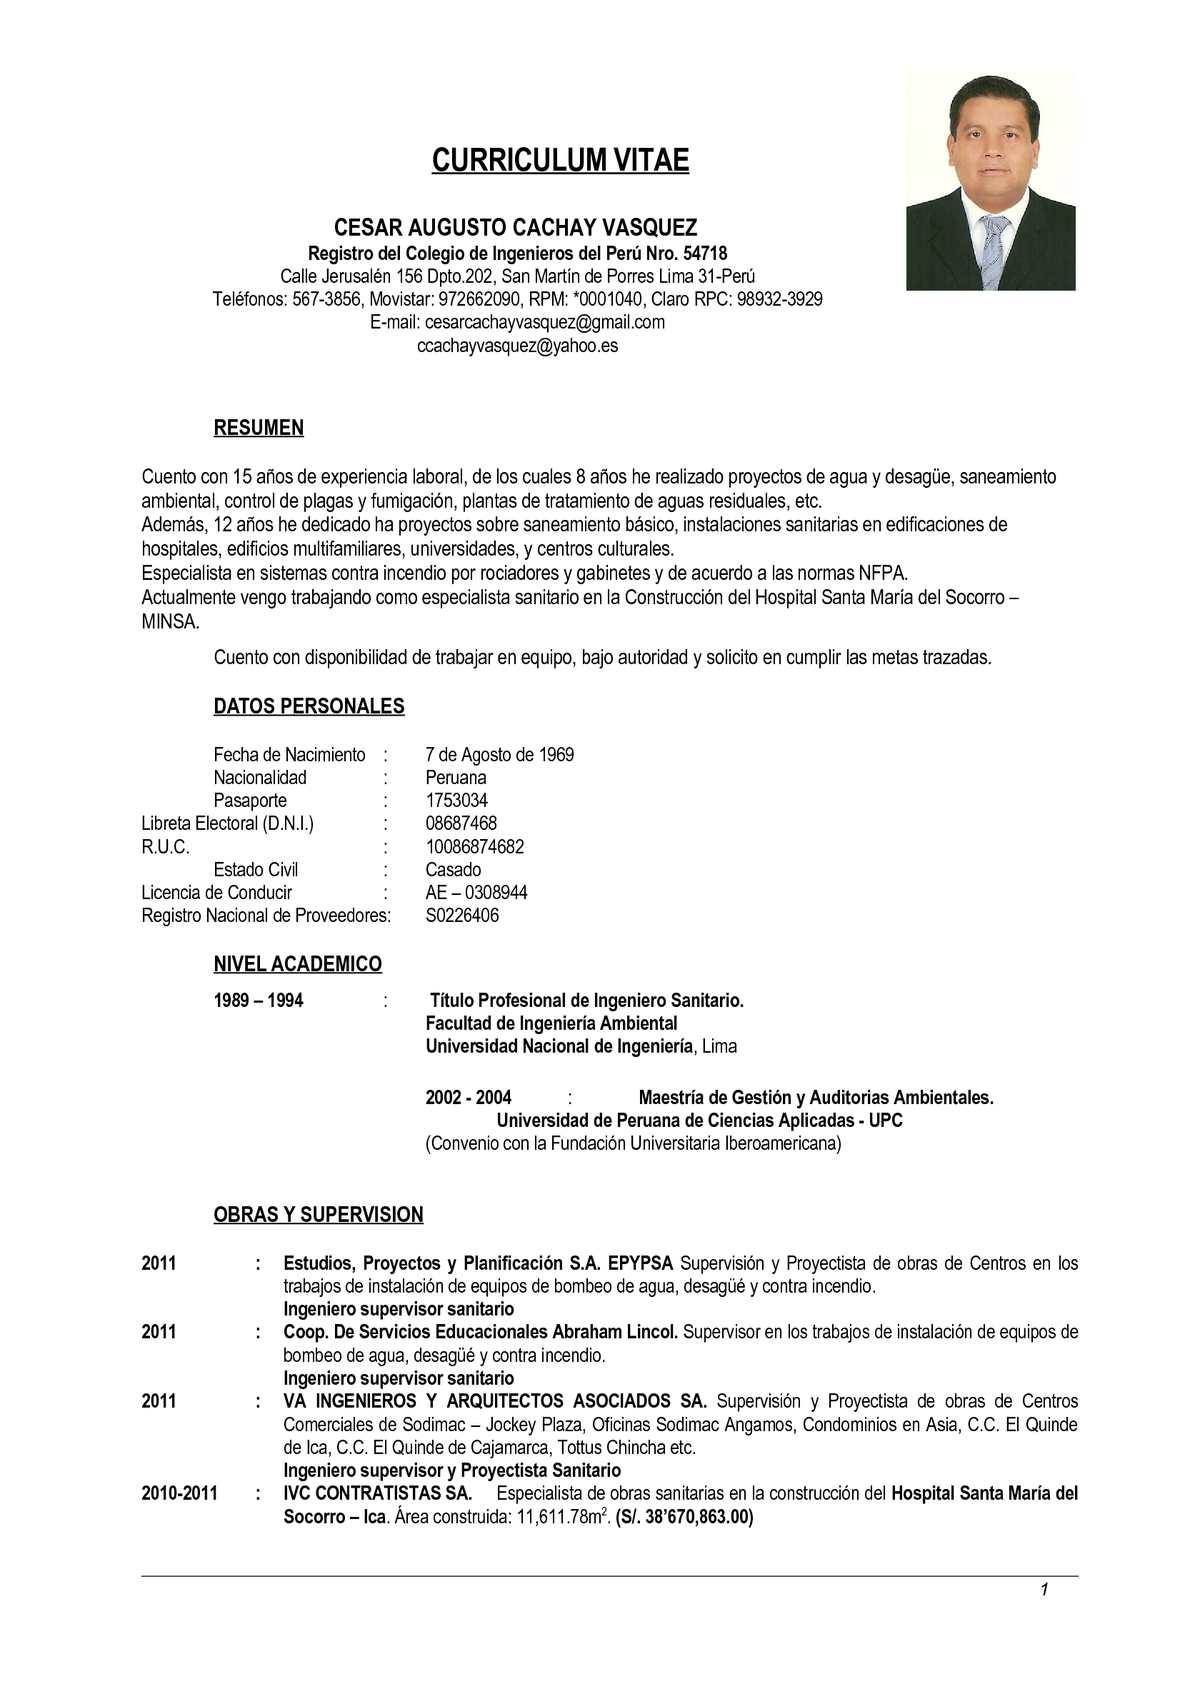 Calaméo - Curriculum Vitae César Cachay